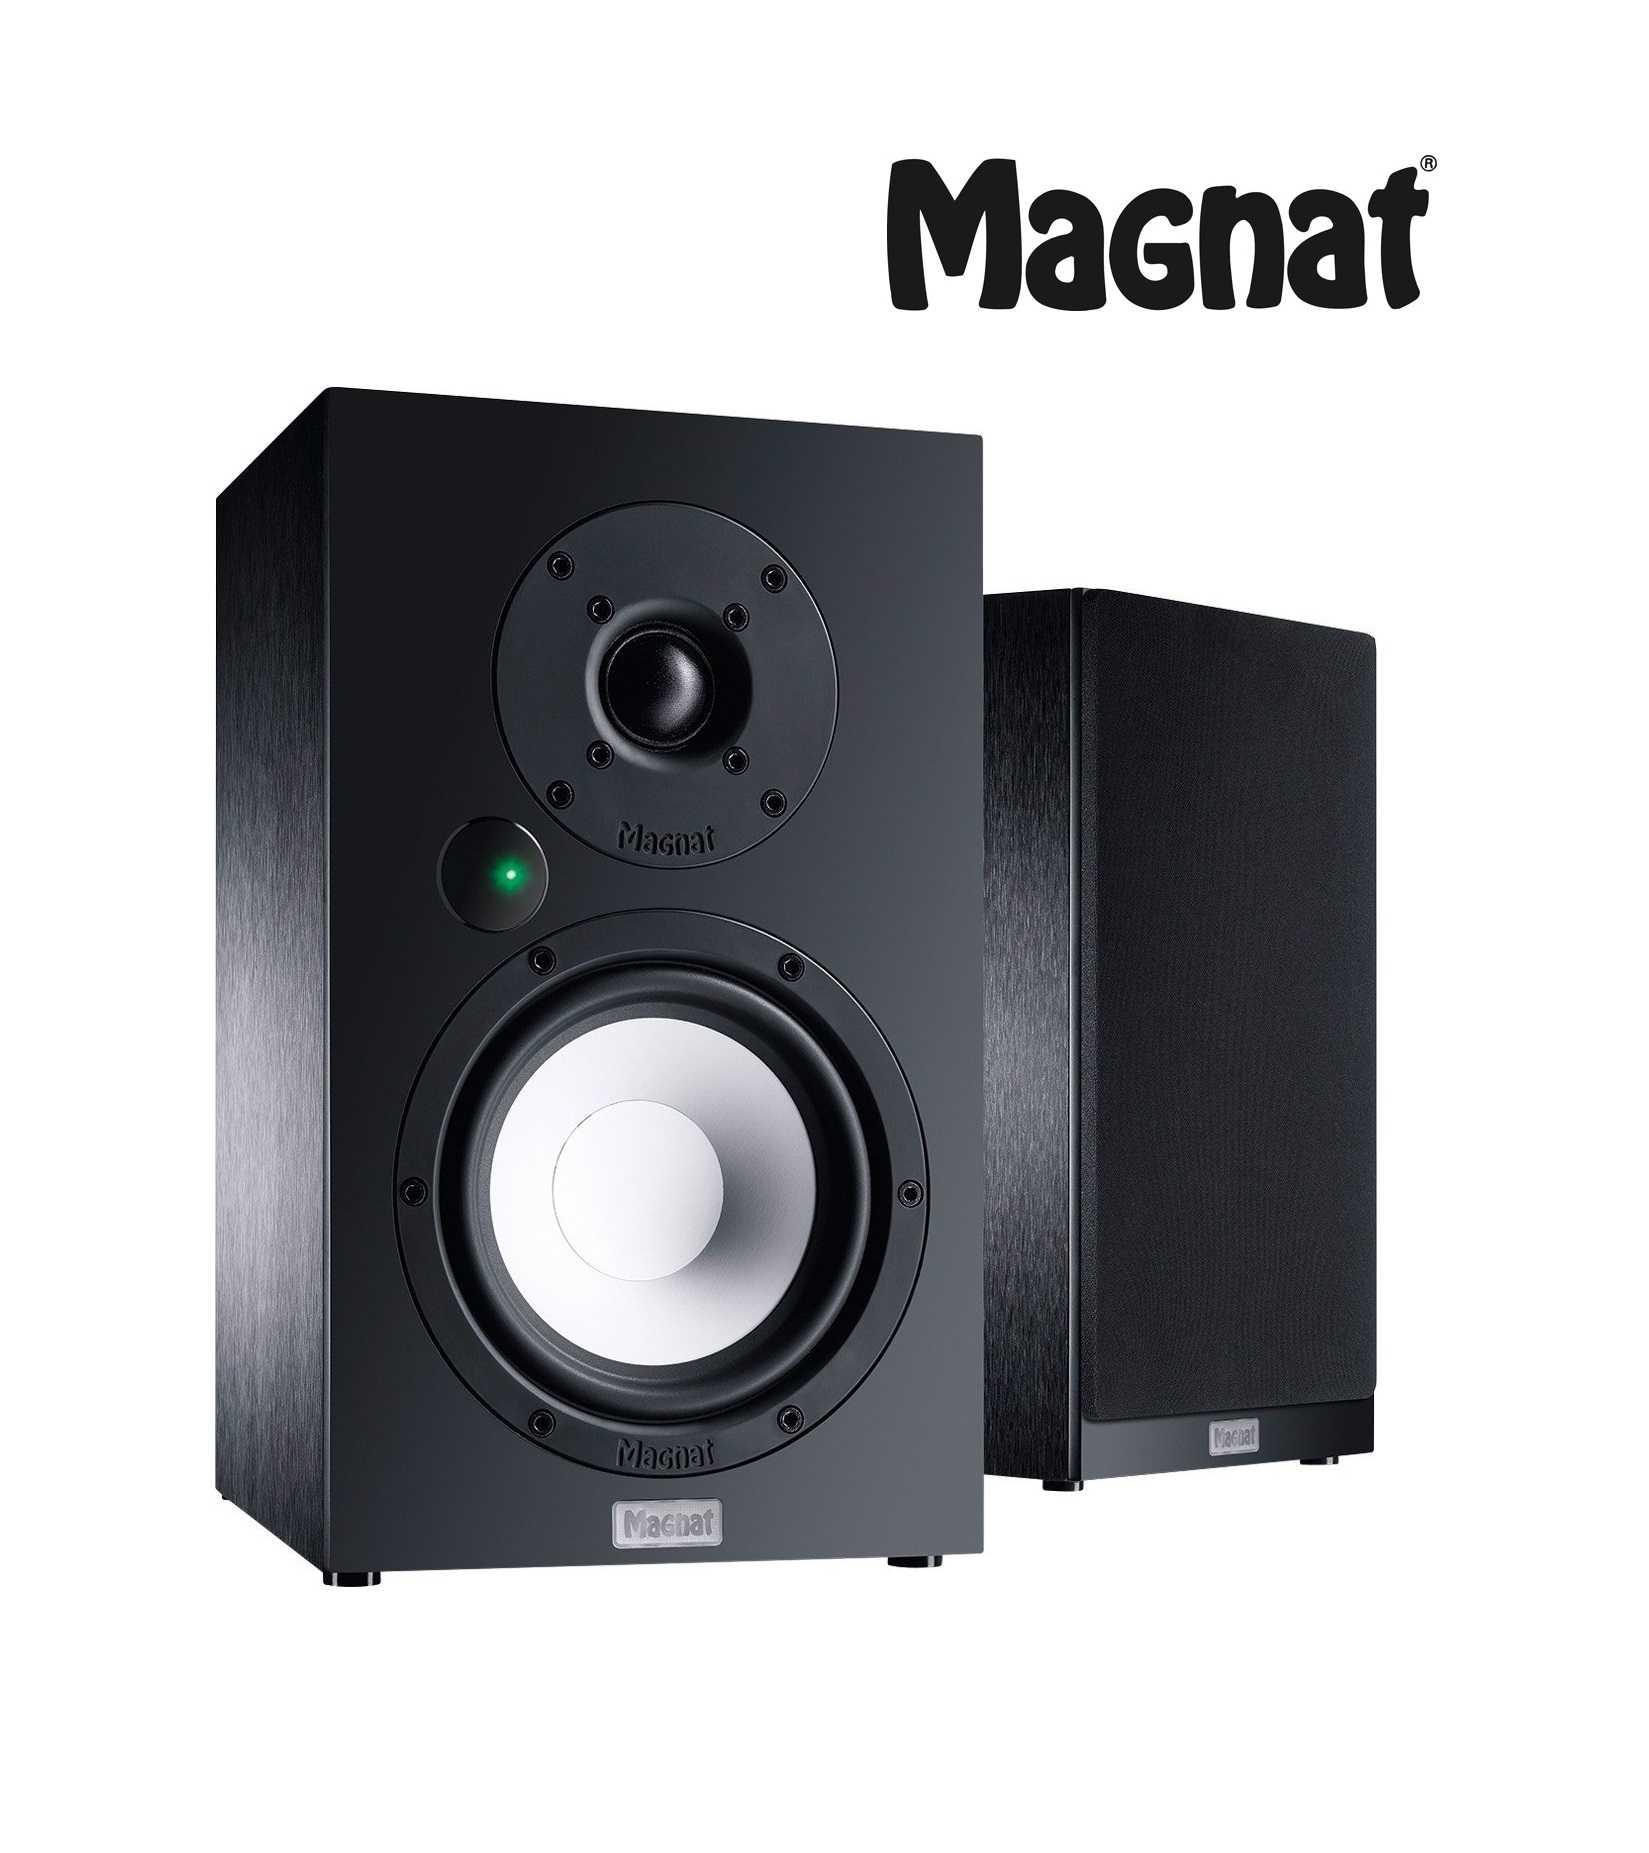 magnat multi monitor 220 vollaktives bluetooth stereolautsprecher set fuer 28399e inkl versand statt 399e 1